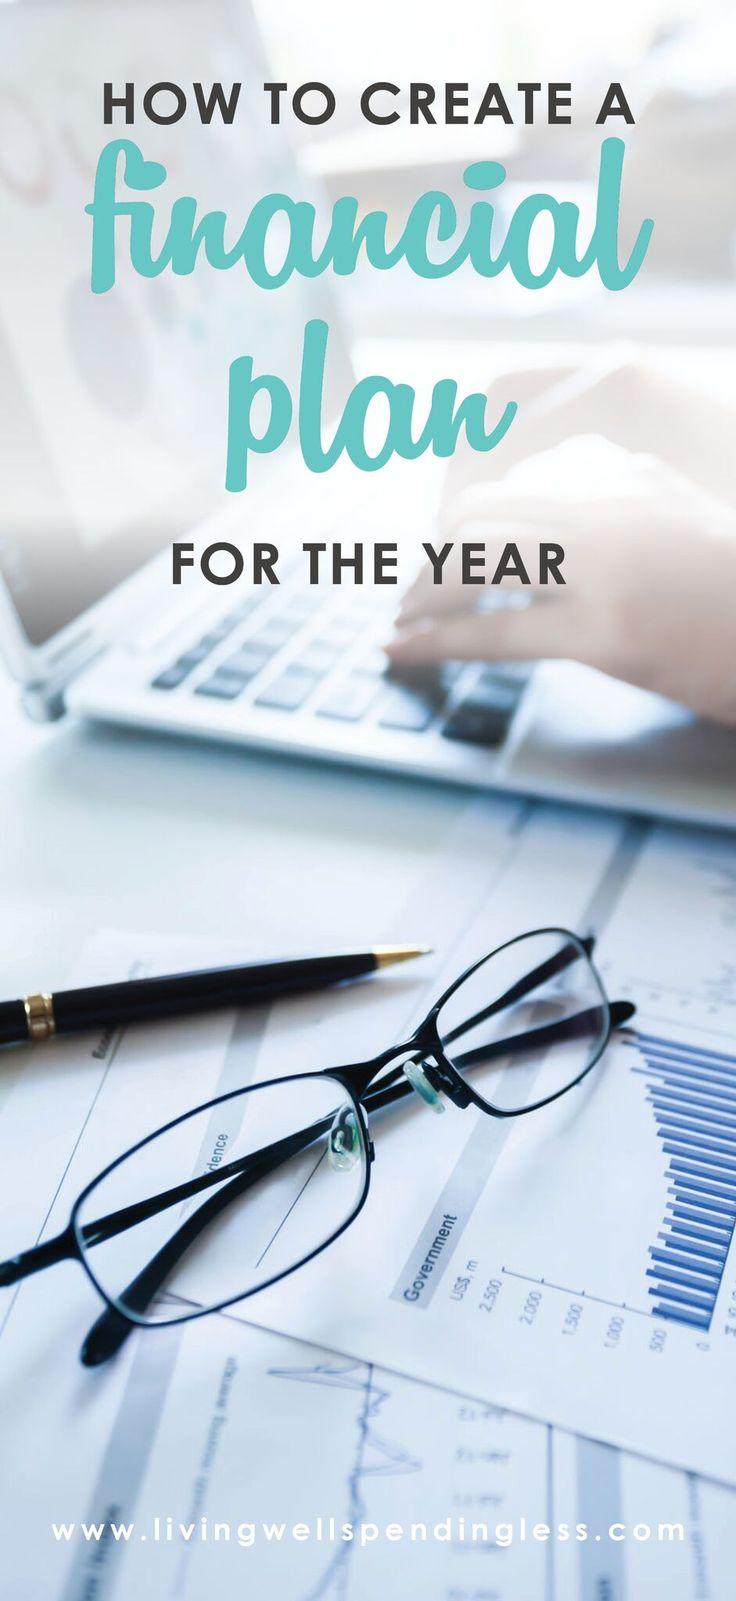 Smart Money Series | Financial Plan for December | Planning for a New Year | December Savings via @lwsl